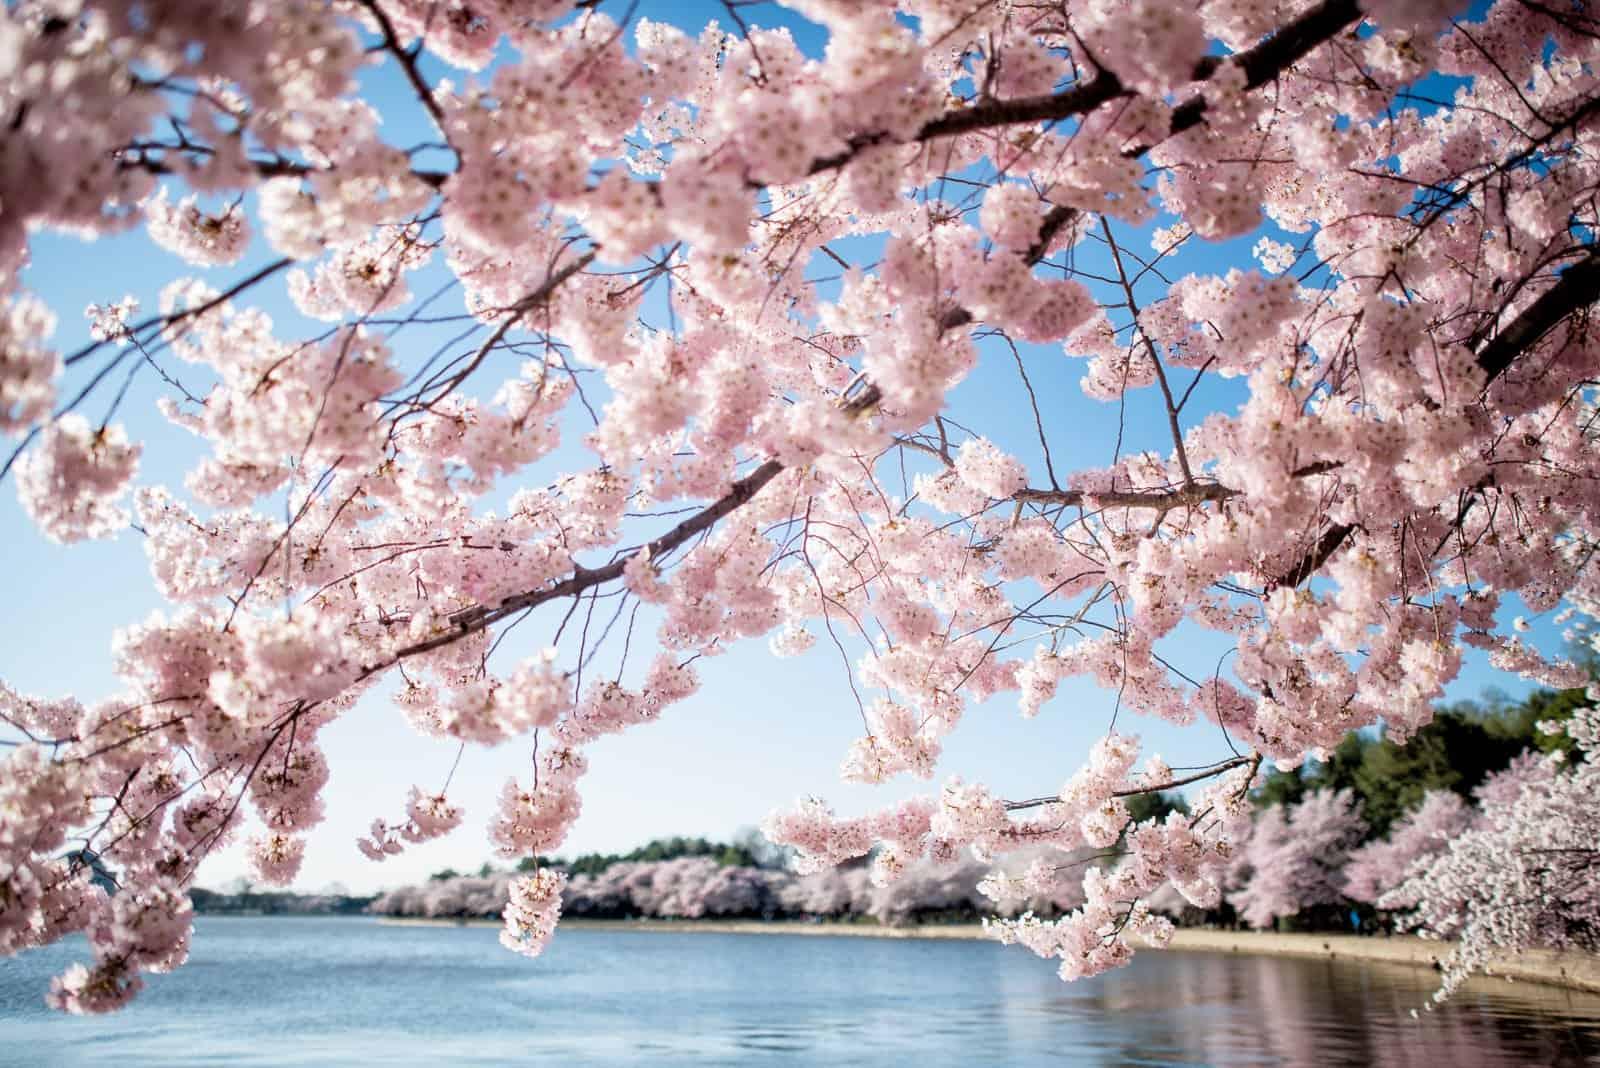 Cherry Blossom DC 2020 Peak Bloom Forecasts | Cherry ...